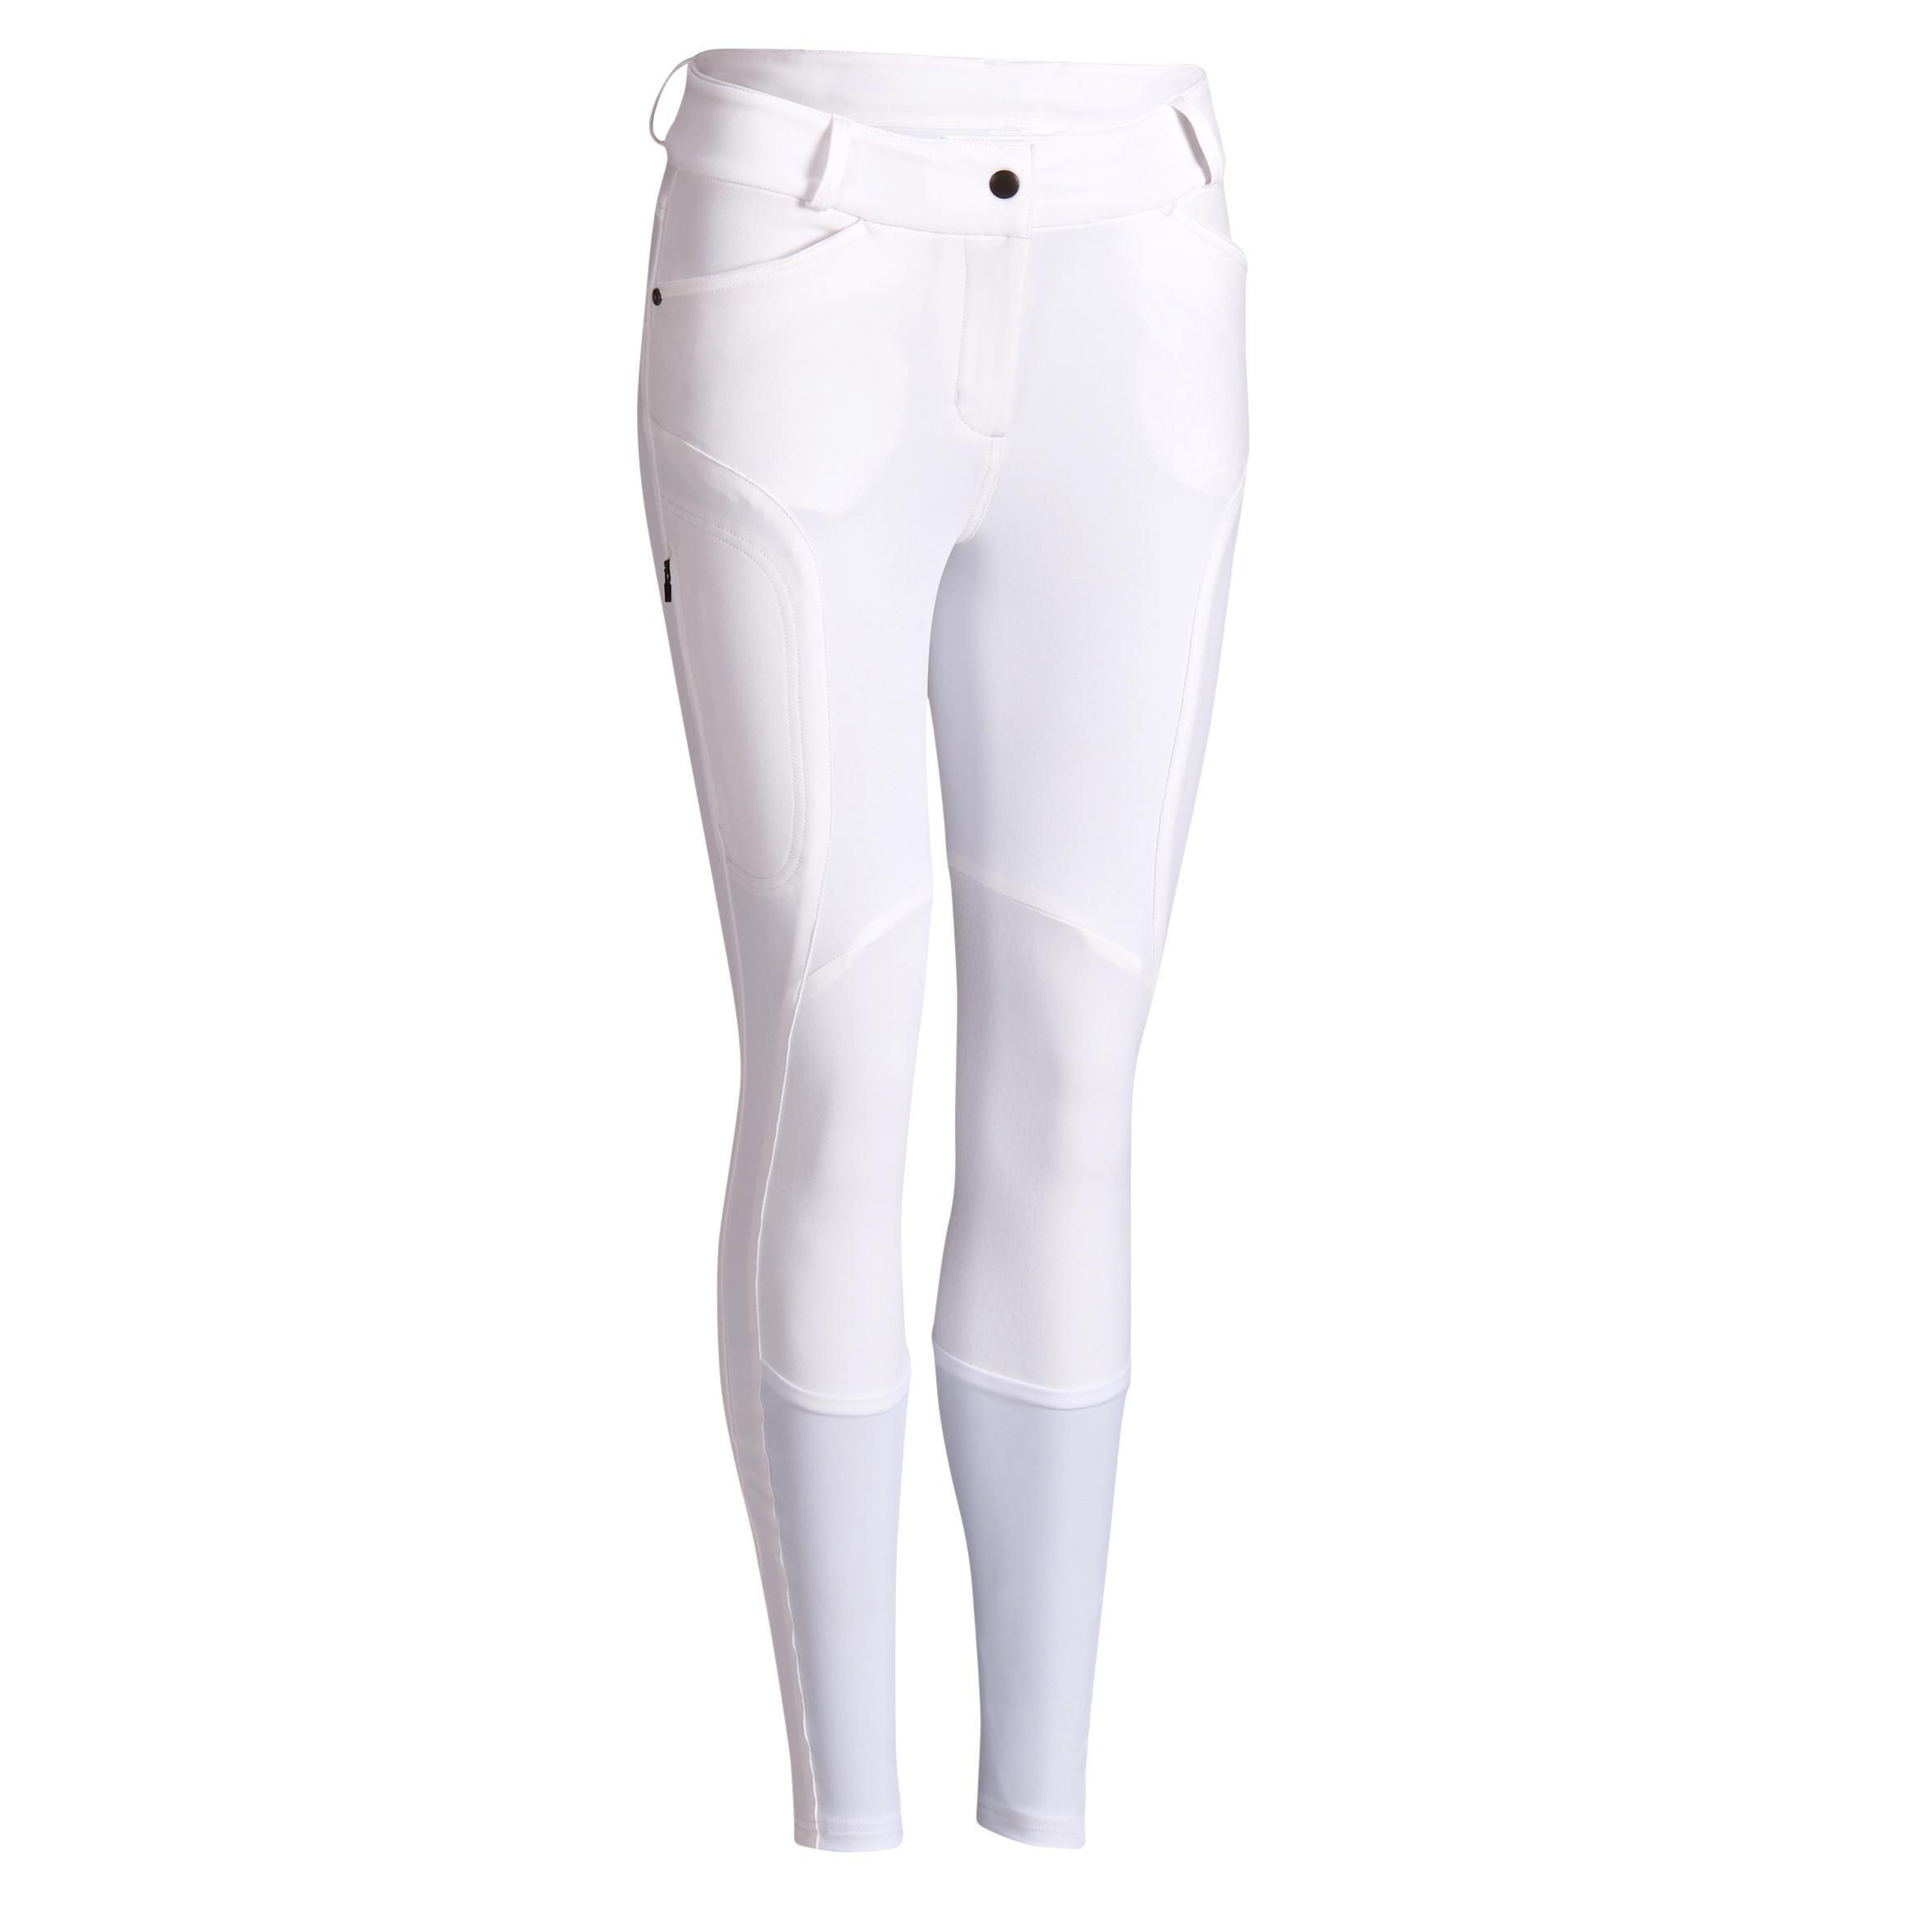 Pantalon concours équitation femme 560 grip jump basanes silicone blanc fouganza